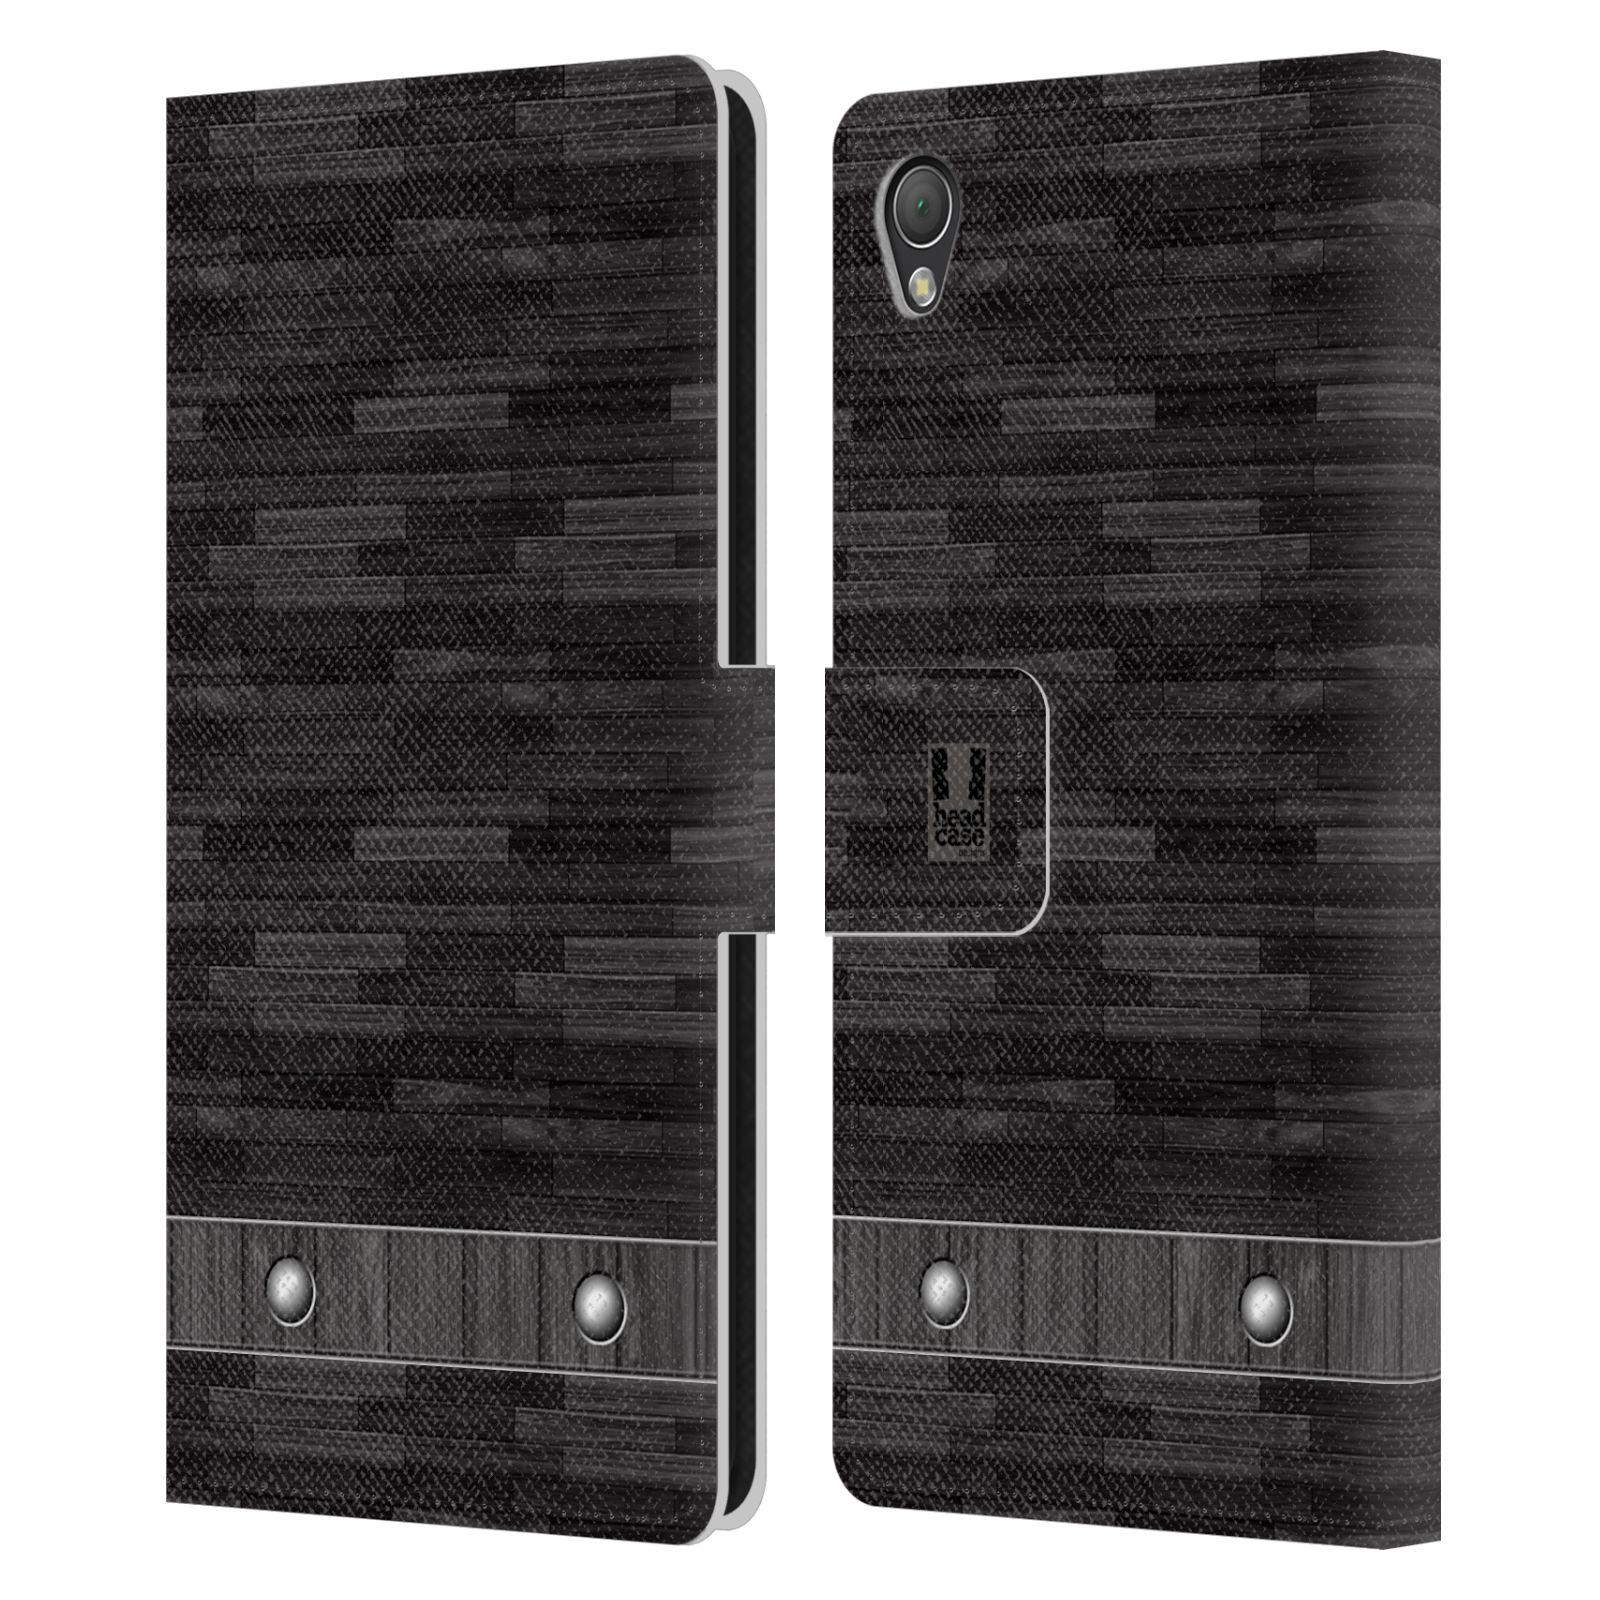 HEAD CASE Flipové pouzdro pro mobil SONY XPERIA Z3 stavební textury dřevo černá barva